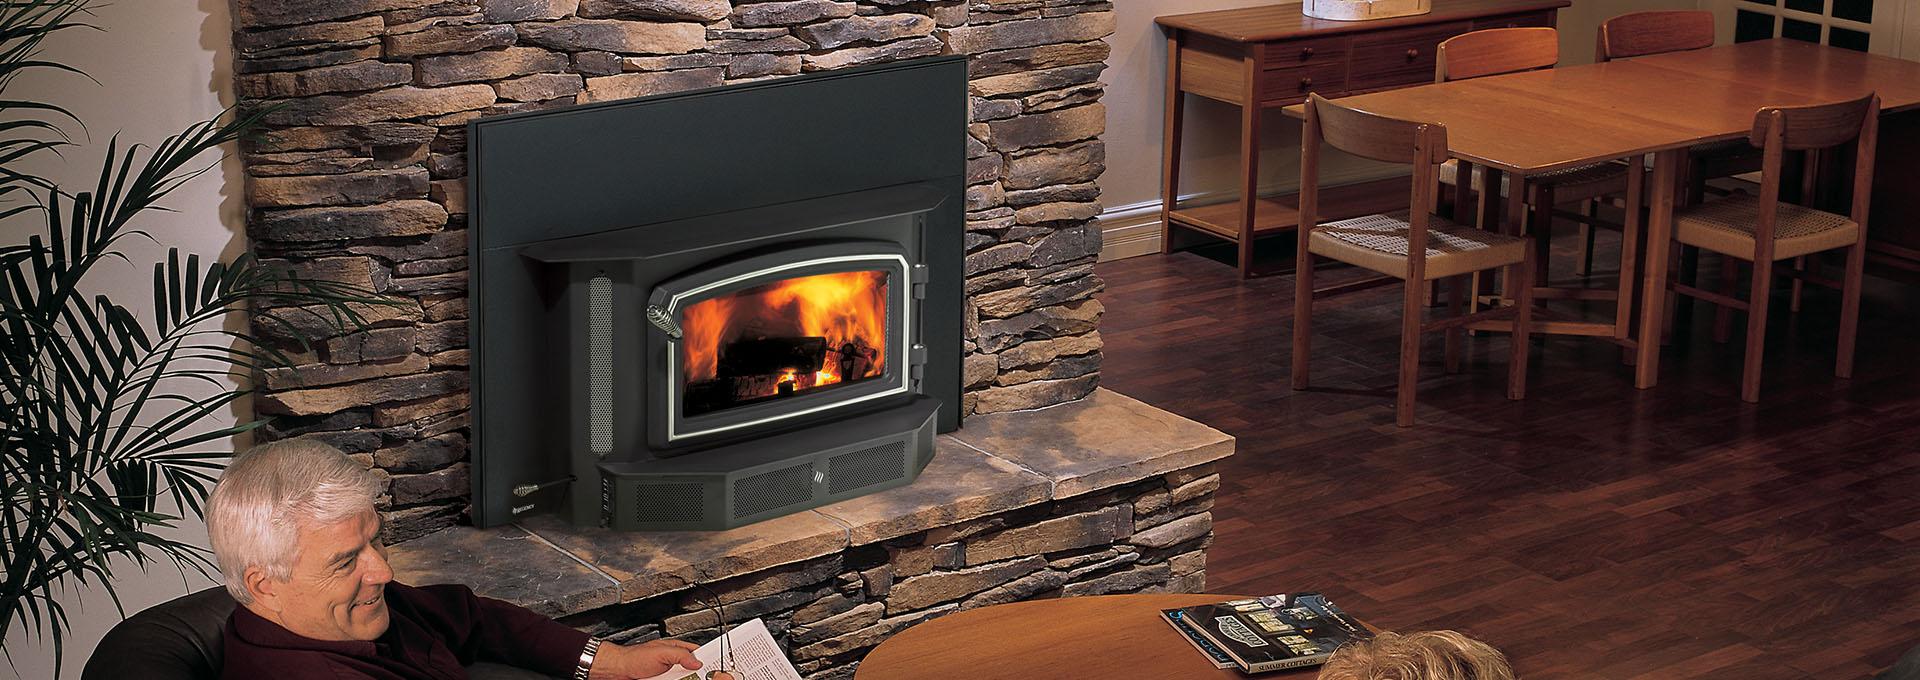 i3100 wood fireplace inserts regency fireplace products